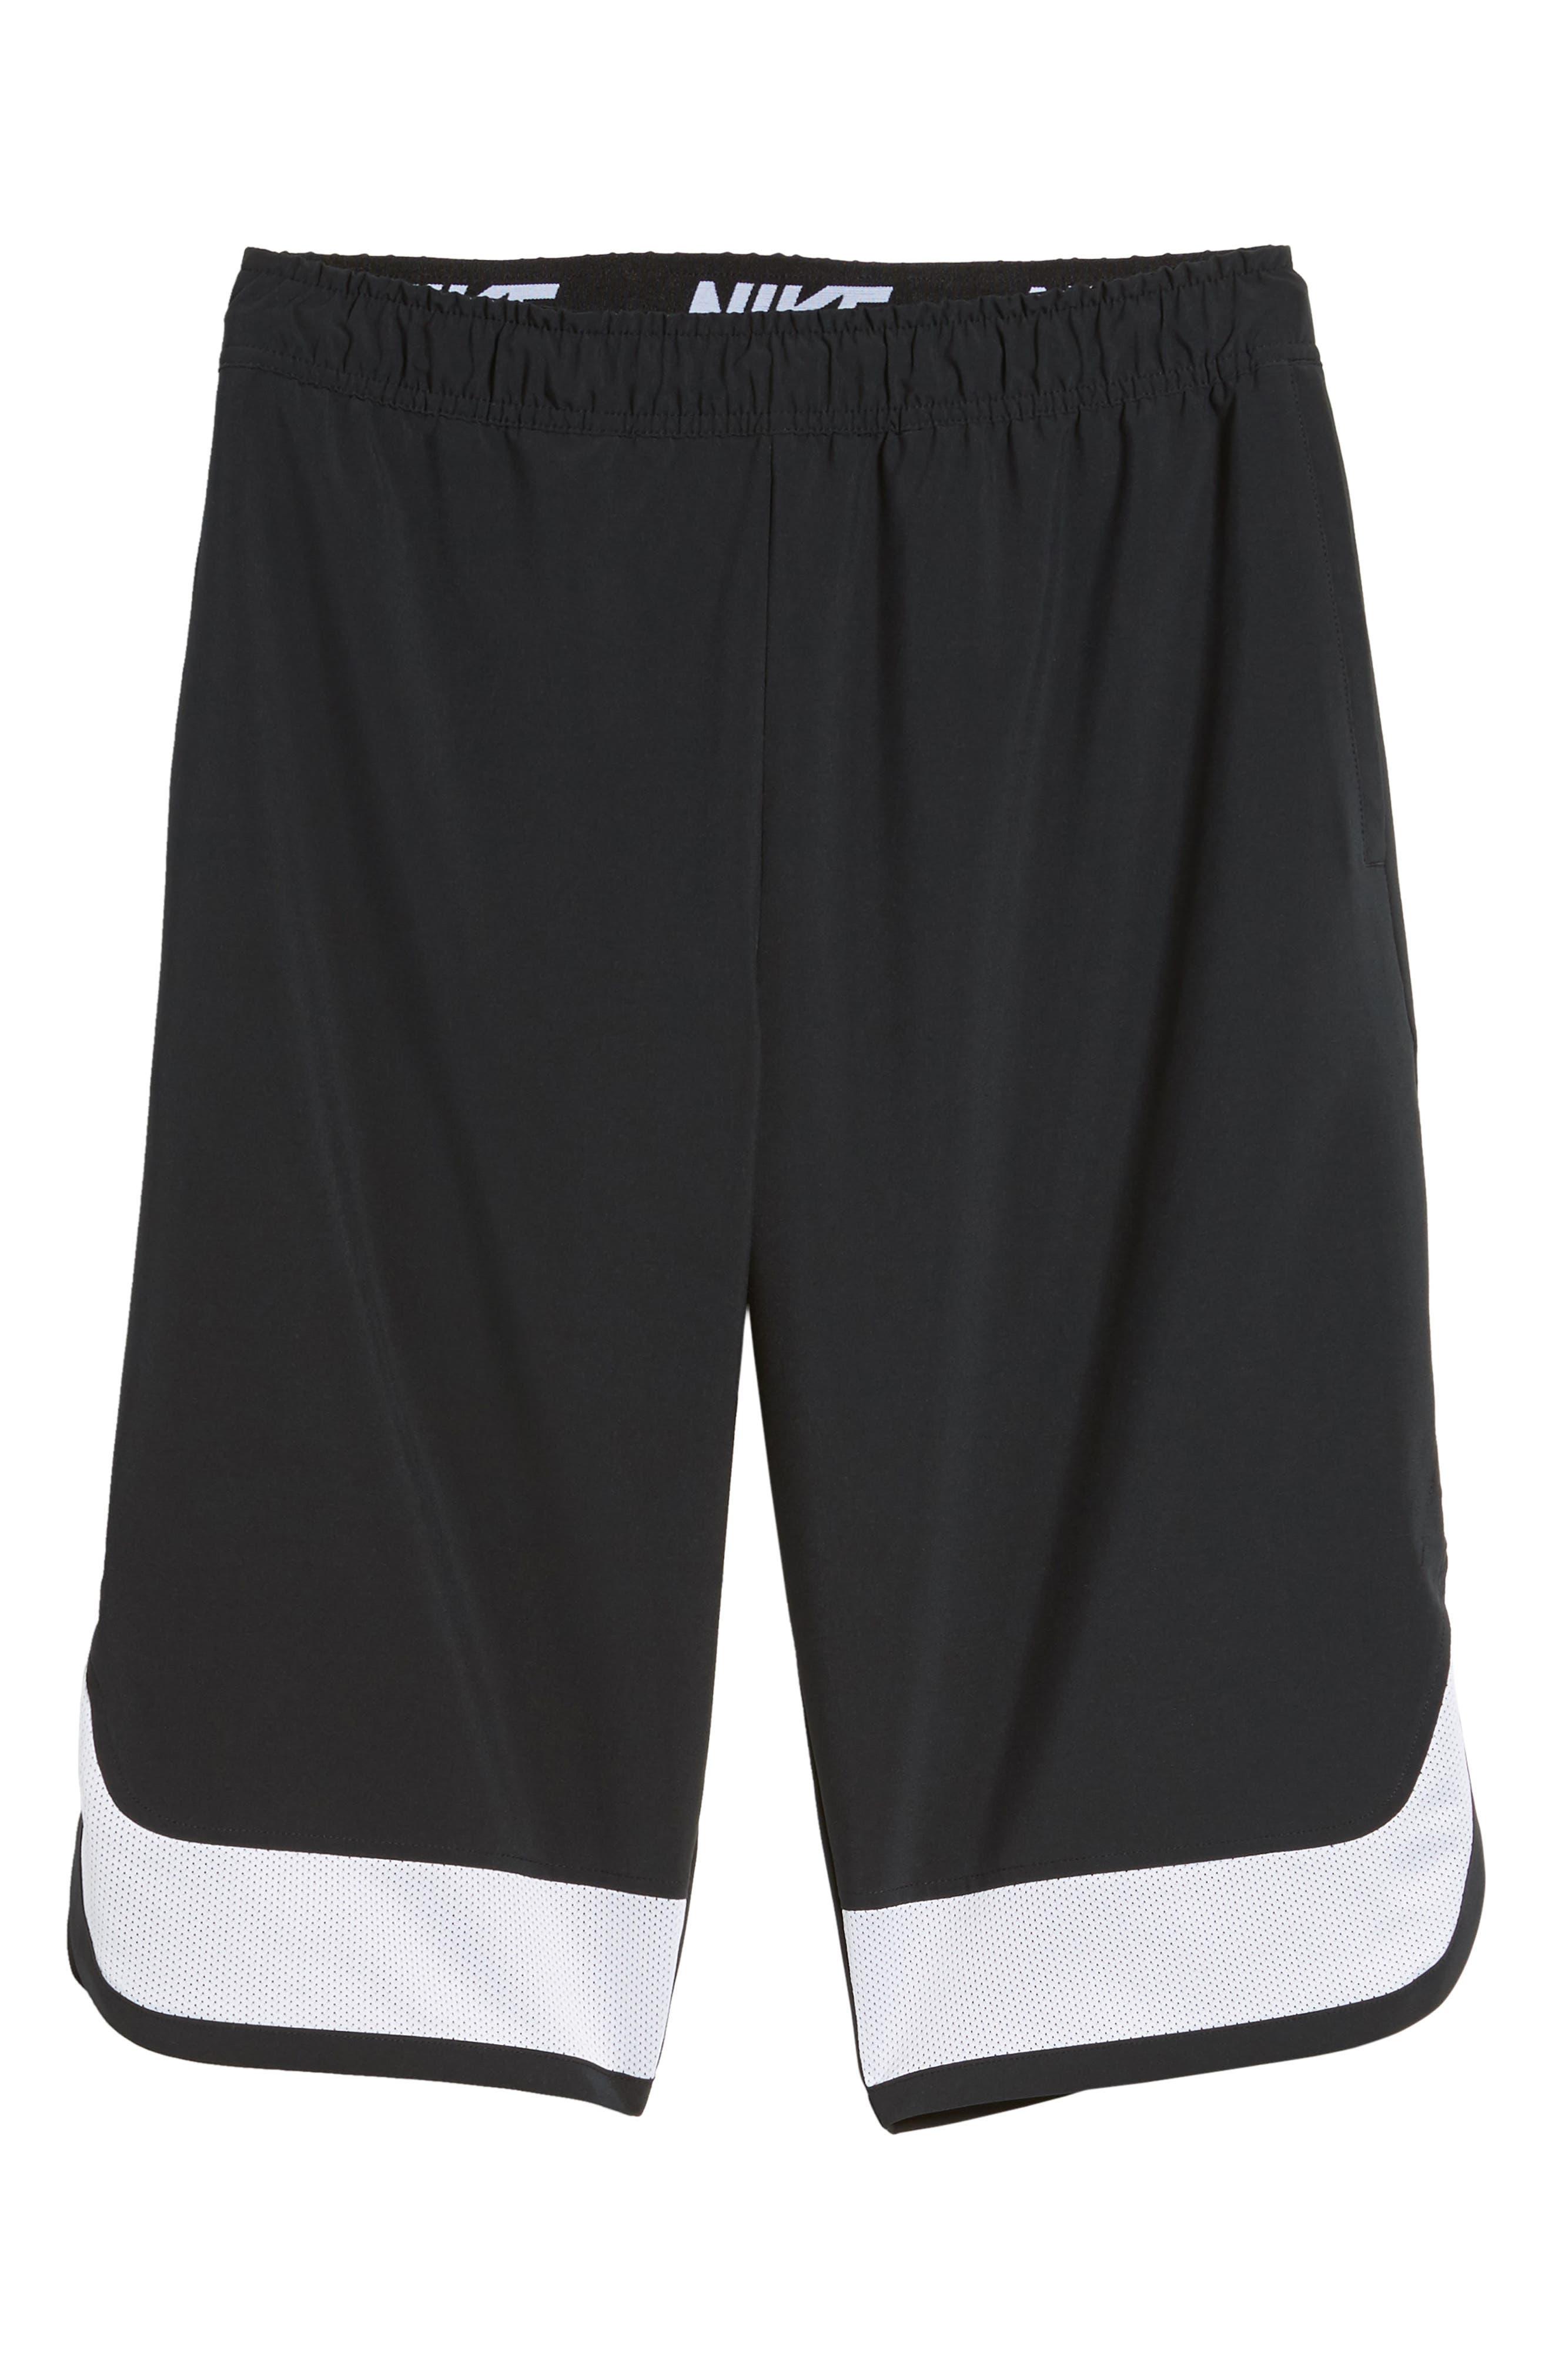 Training Flex PX Shorts,                             Alternate thumbnail 6, color,                             BLACK/ WHITE/ WHITE